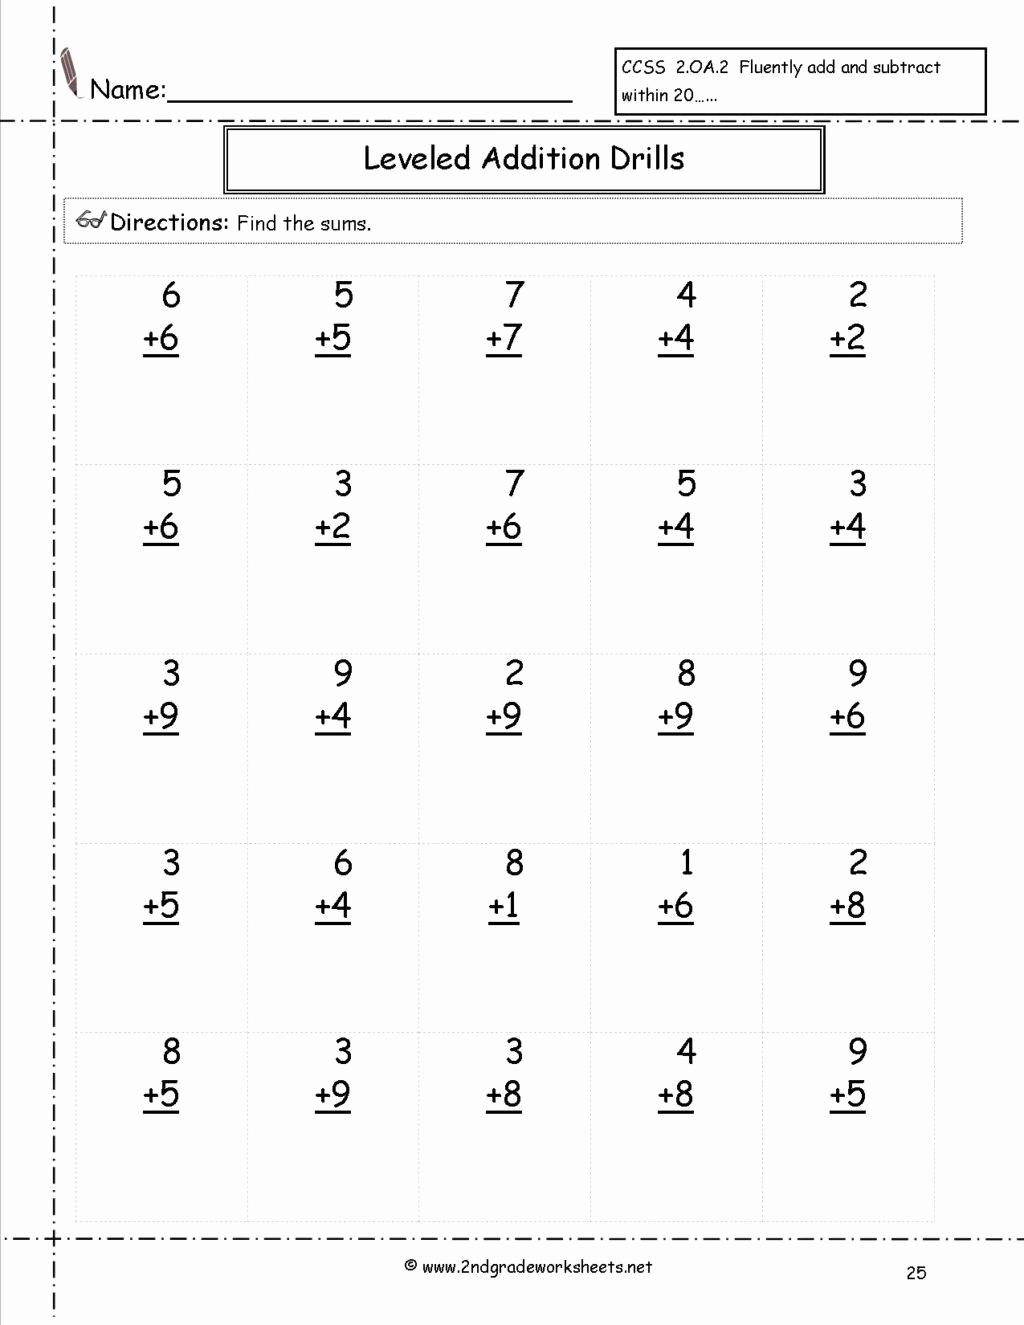 Cracking the Code Math Worksheets New 30 Self Esteem Worksheets Girls